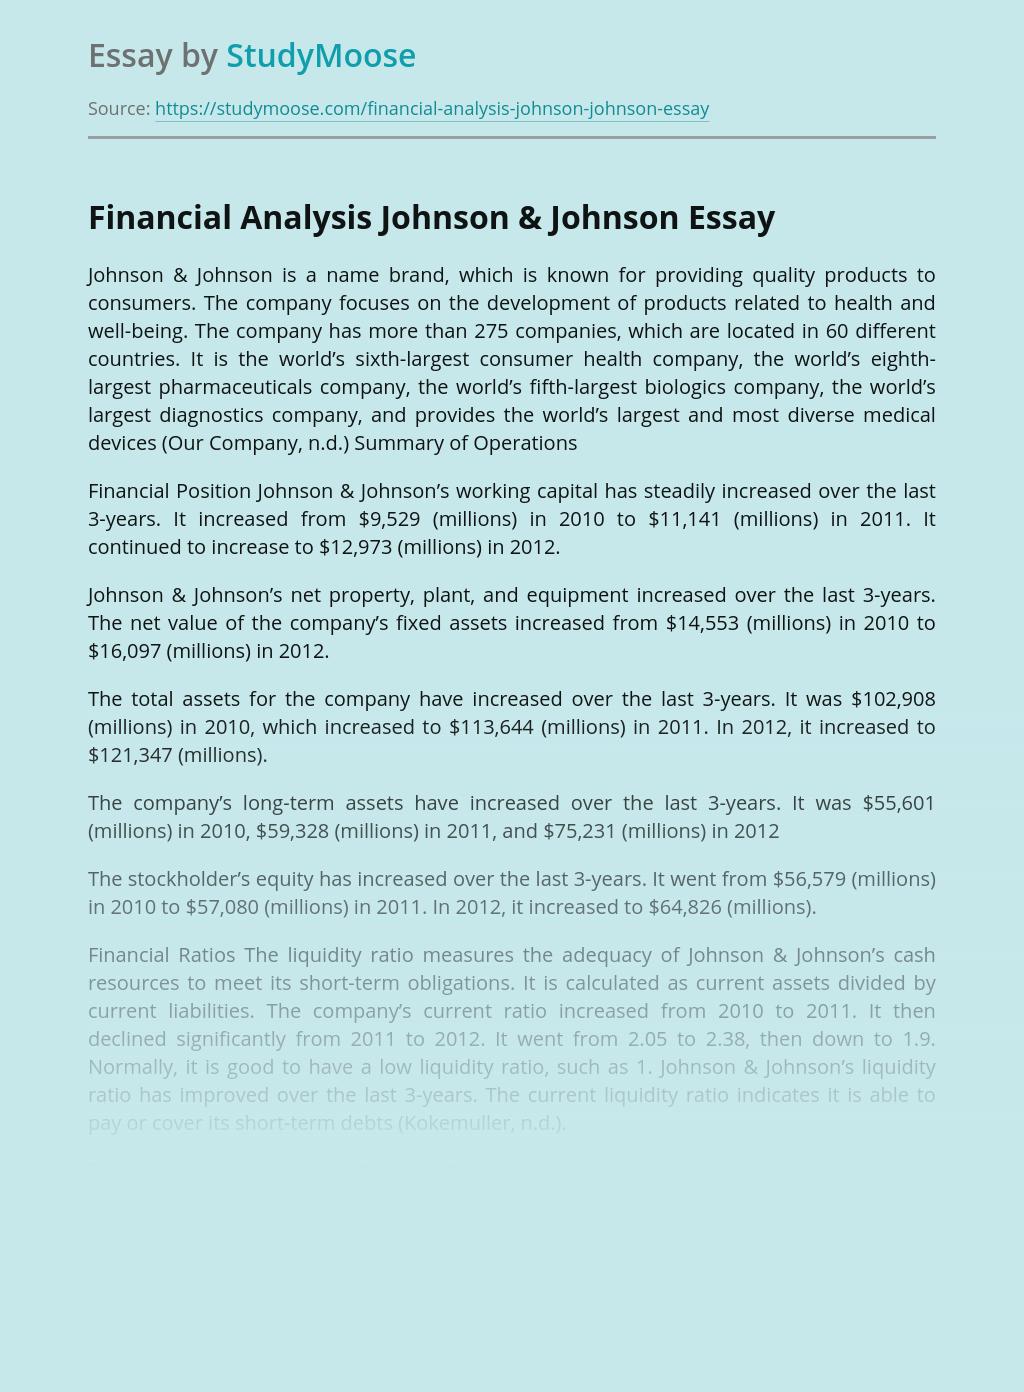 Financial Analysis Johnson & Johnson